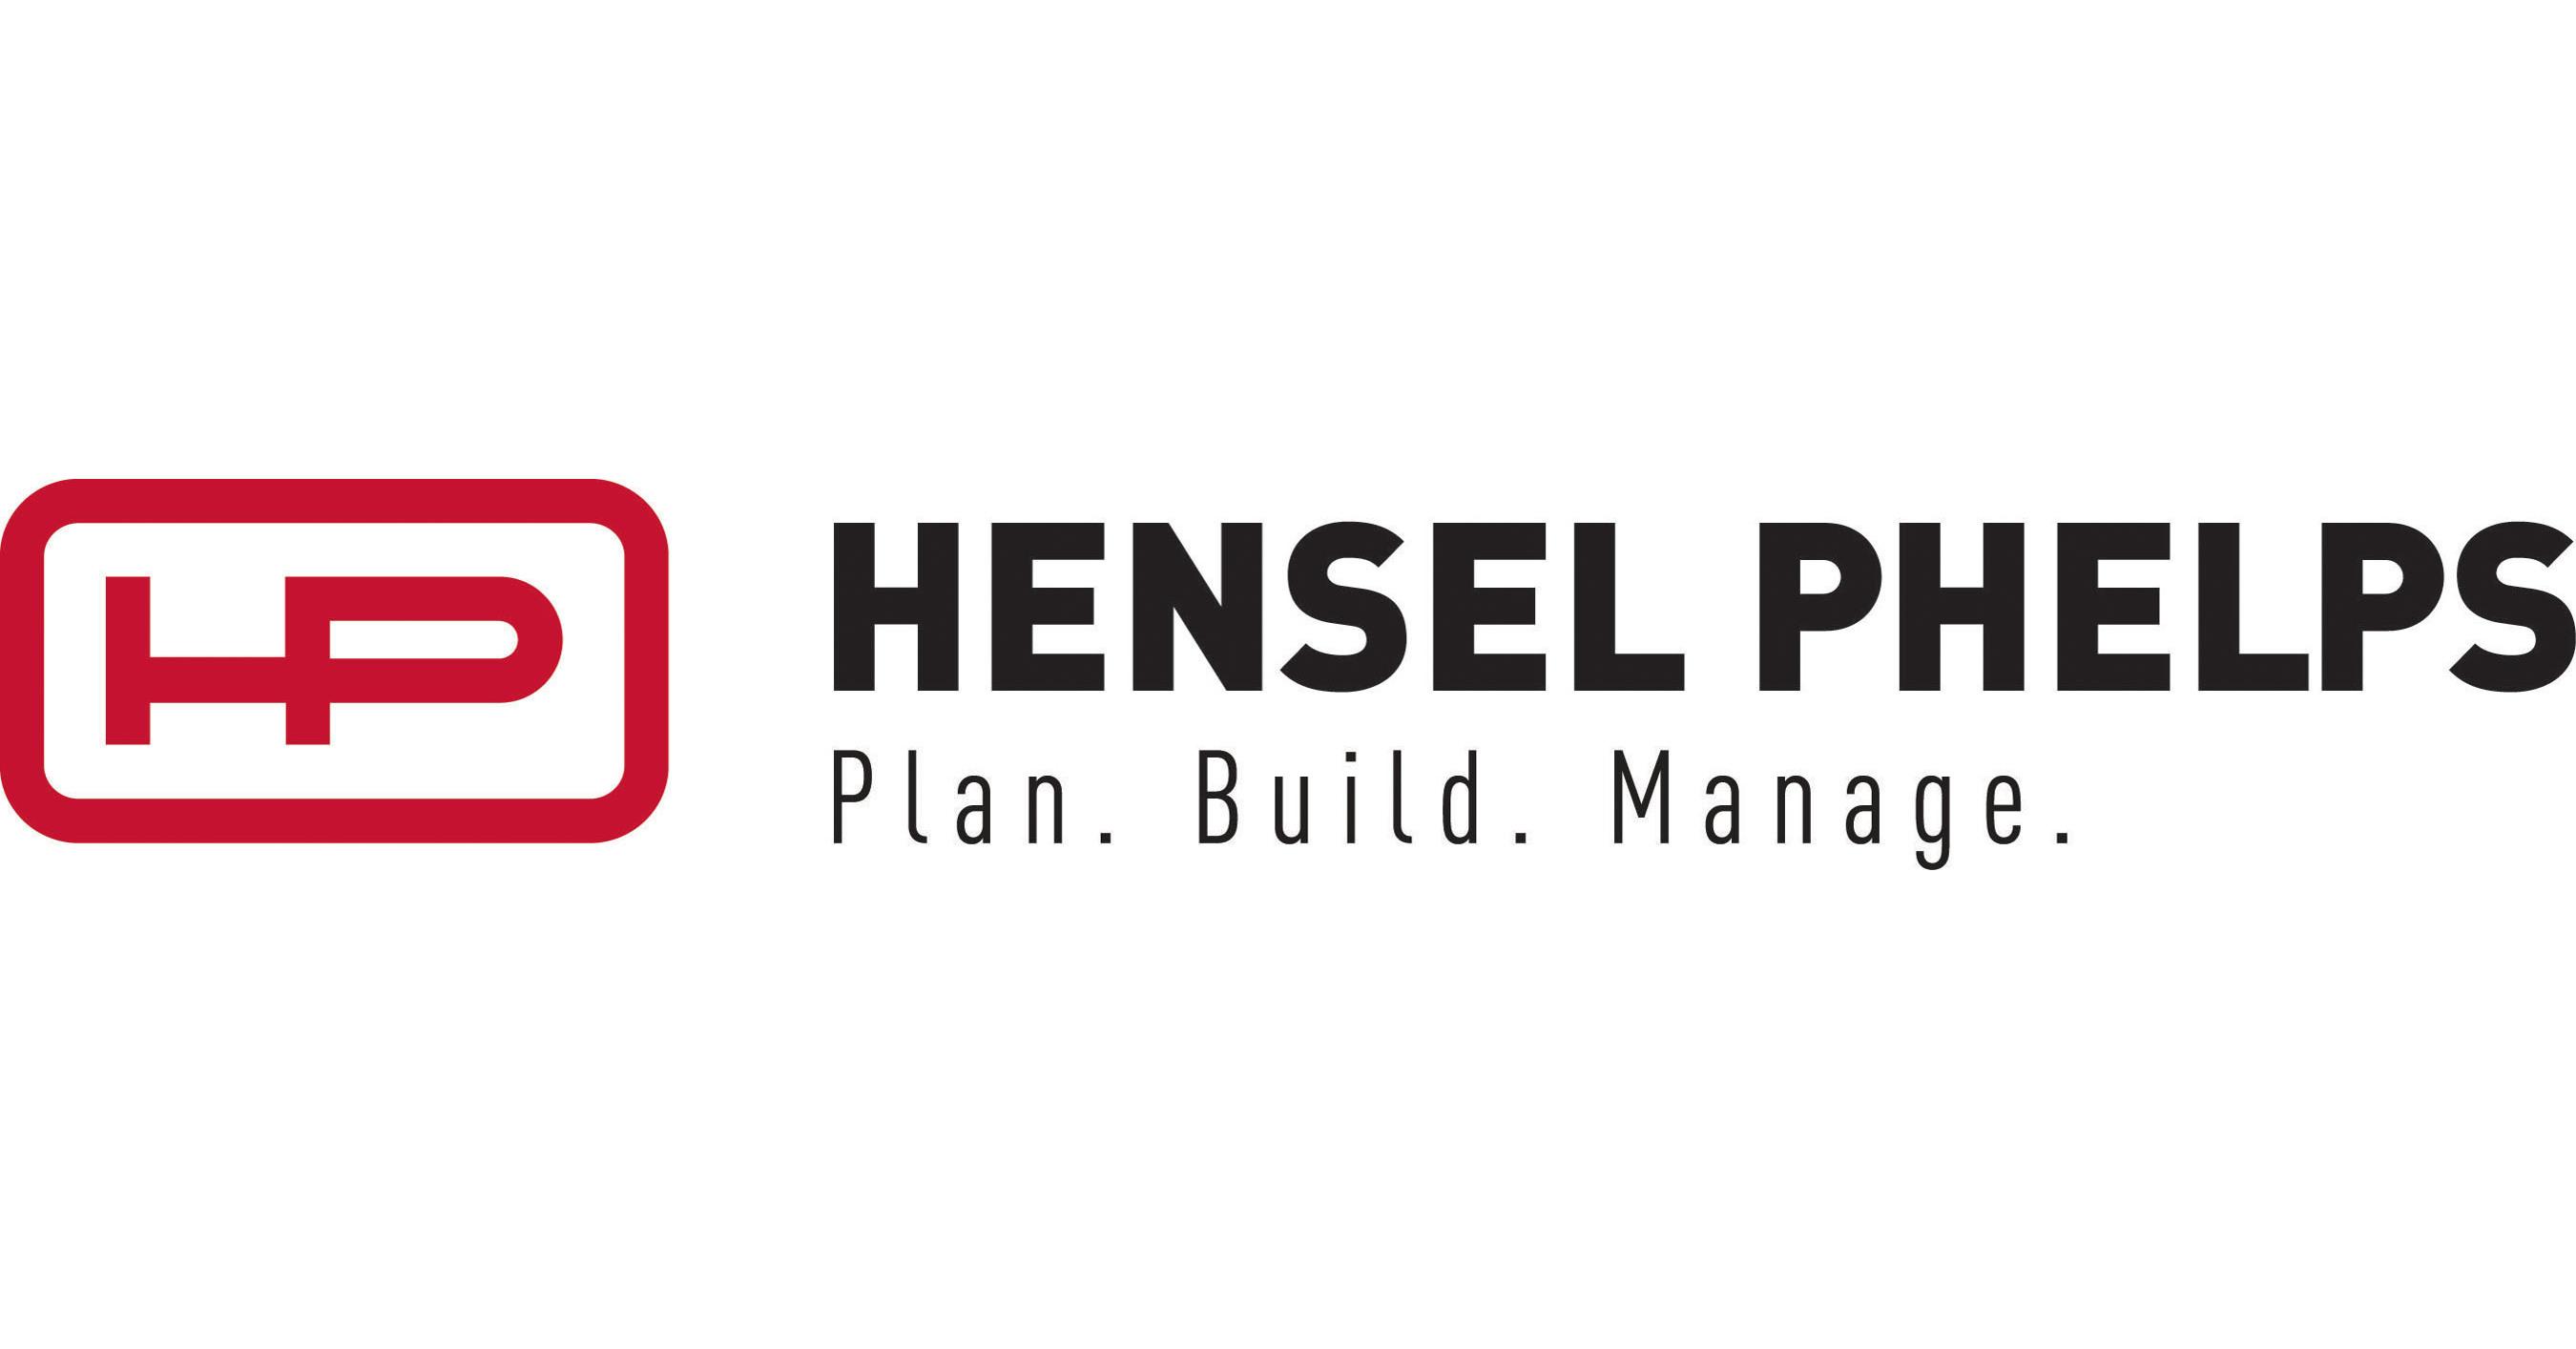 Hensel Phelps Wins Three DBIA-Western Pacific Region 2017 Design